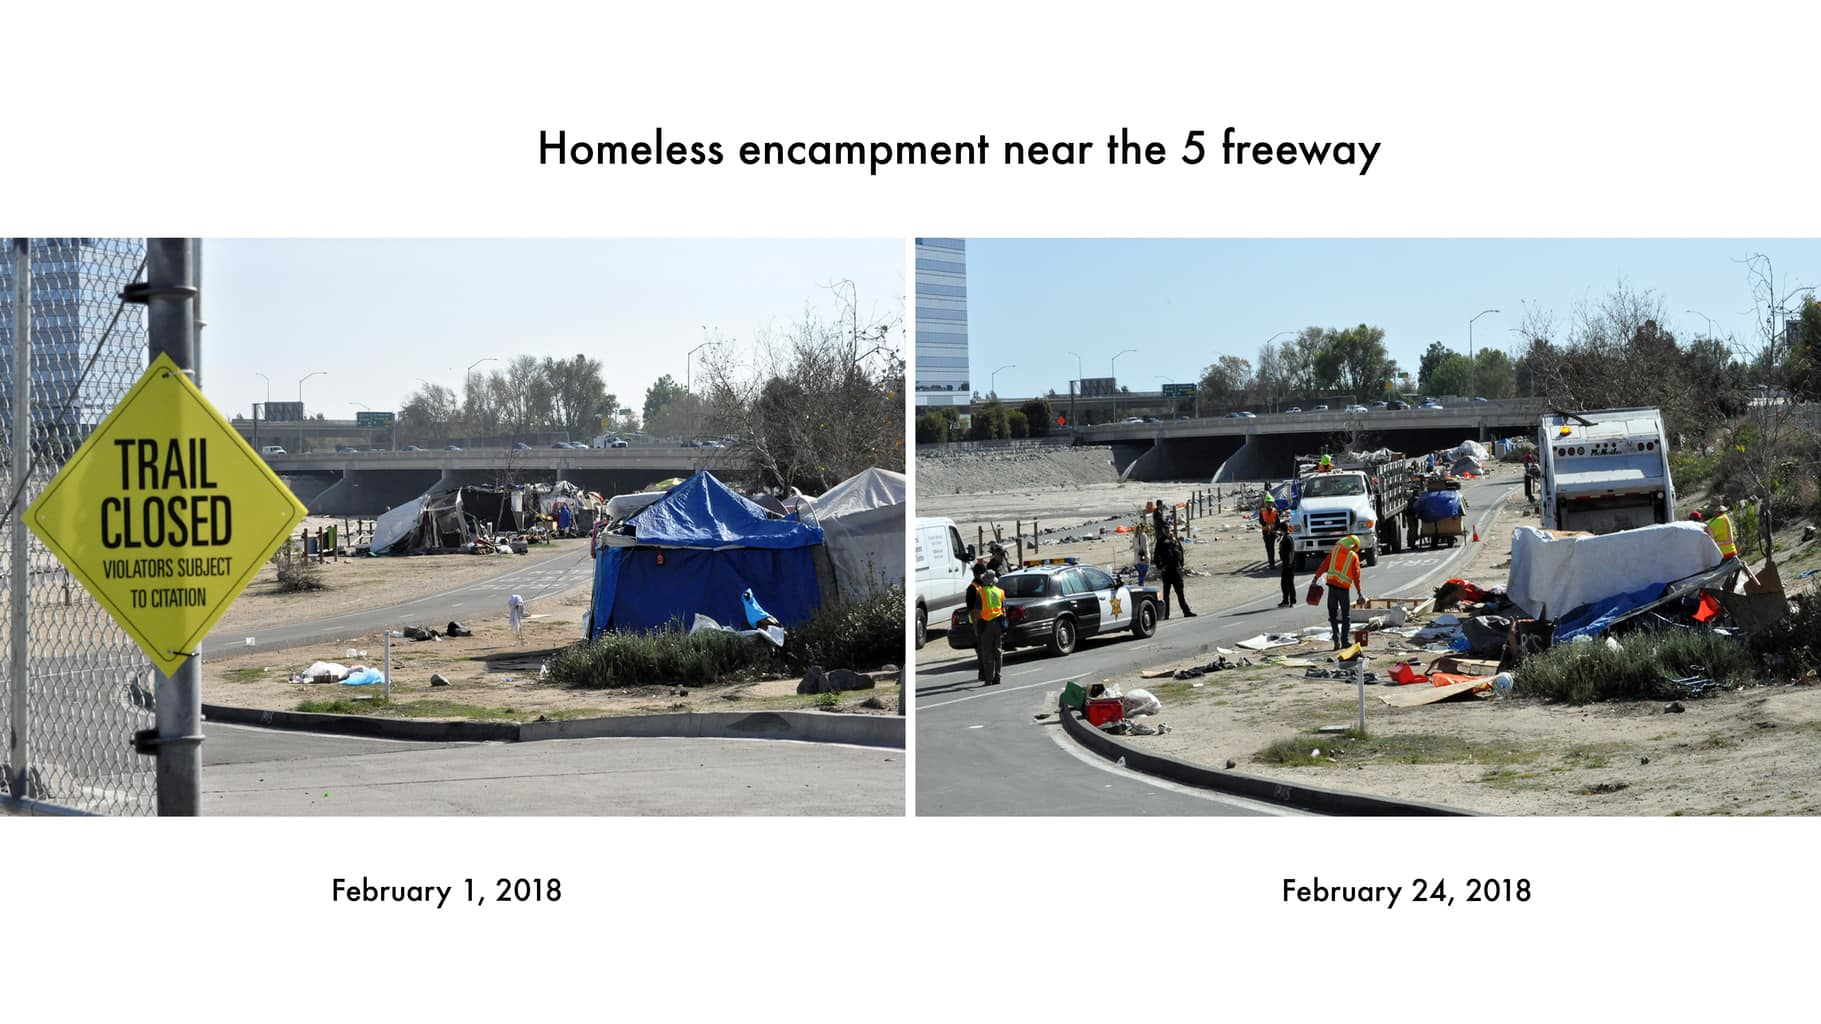 County Wraps Up Homeless Evictions At Santa Ana Riverbed